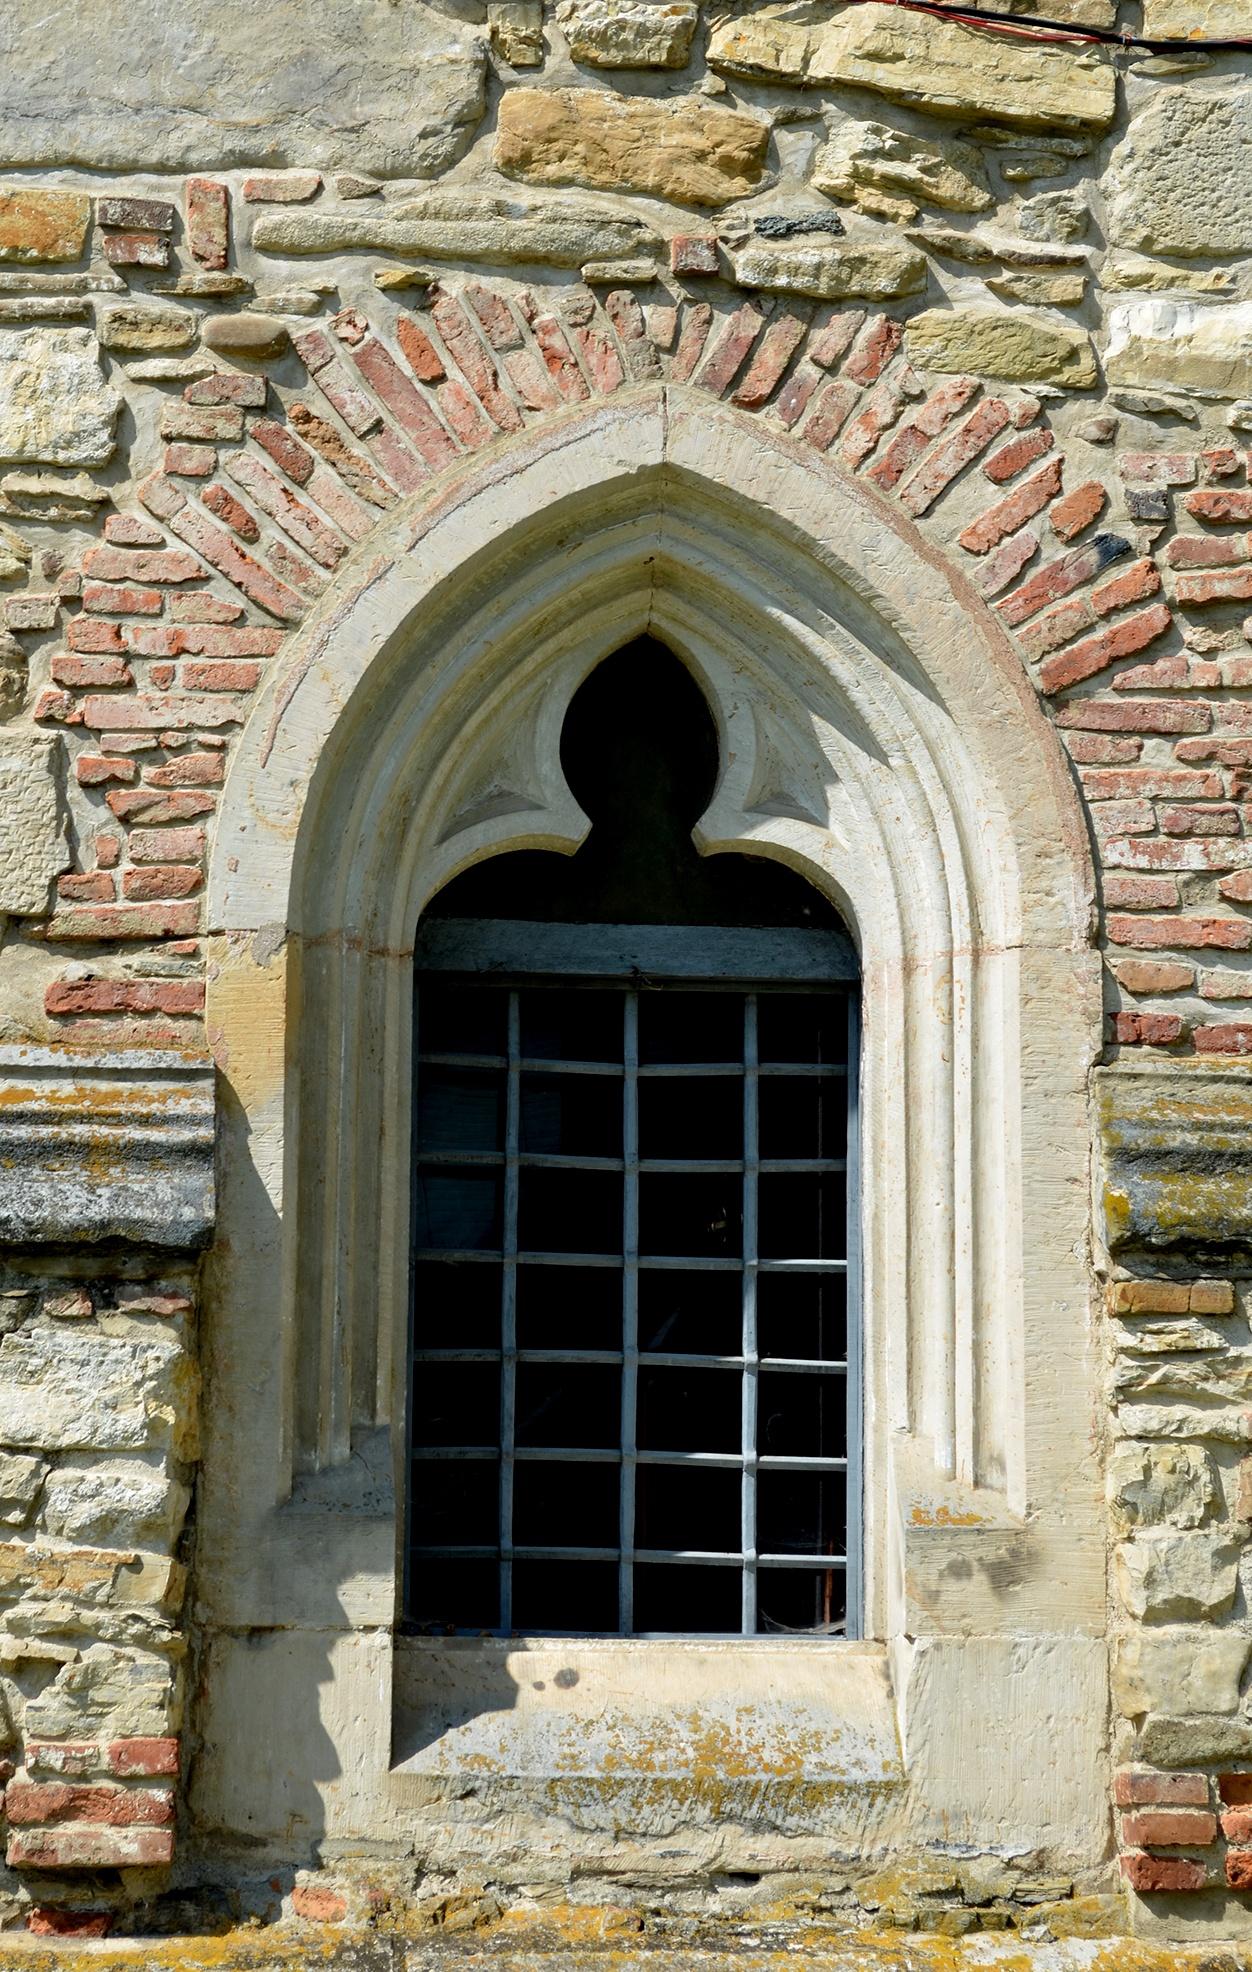 Window at Sturdza Castle by GeorgiAna Narcisa